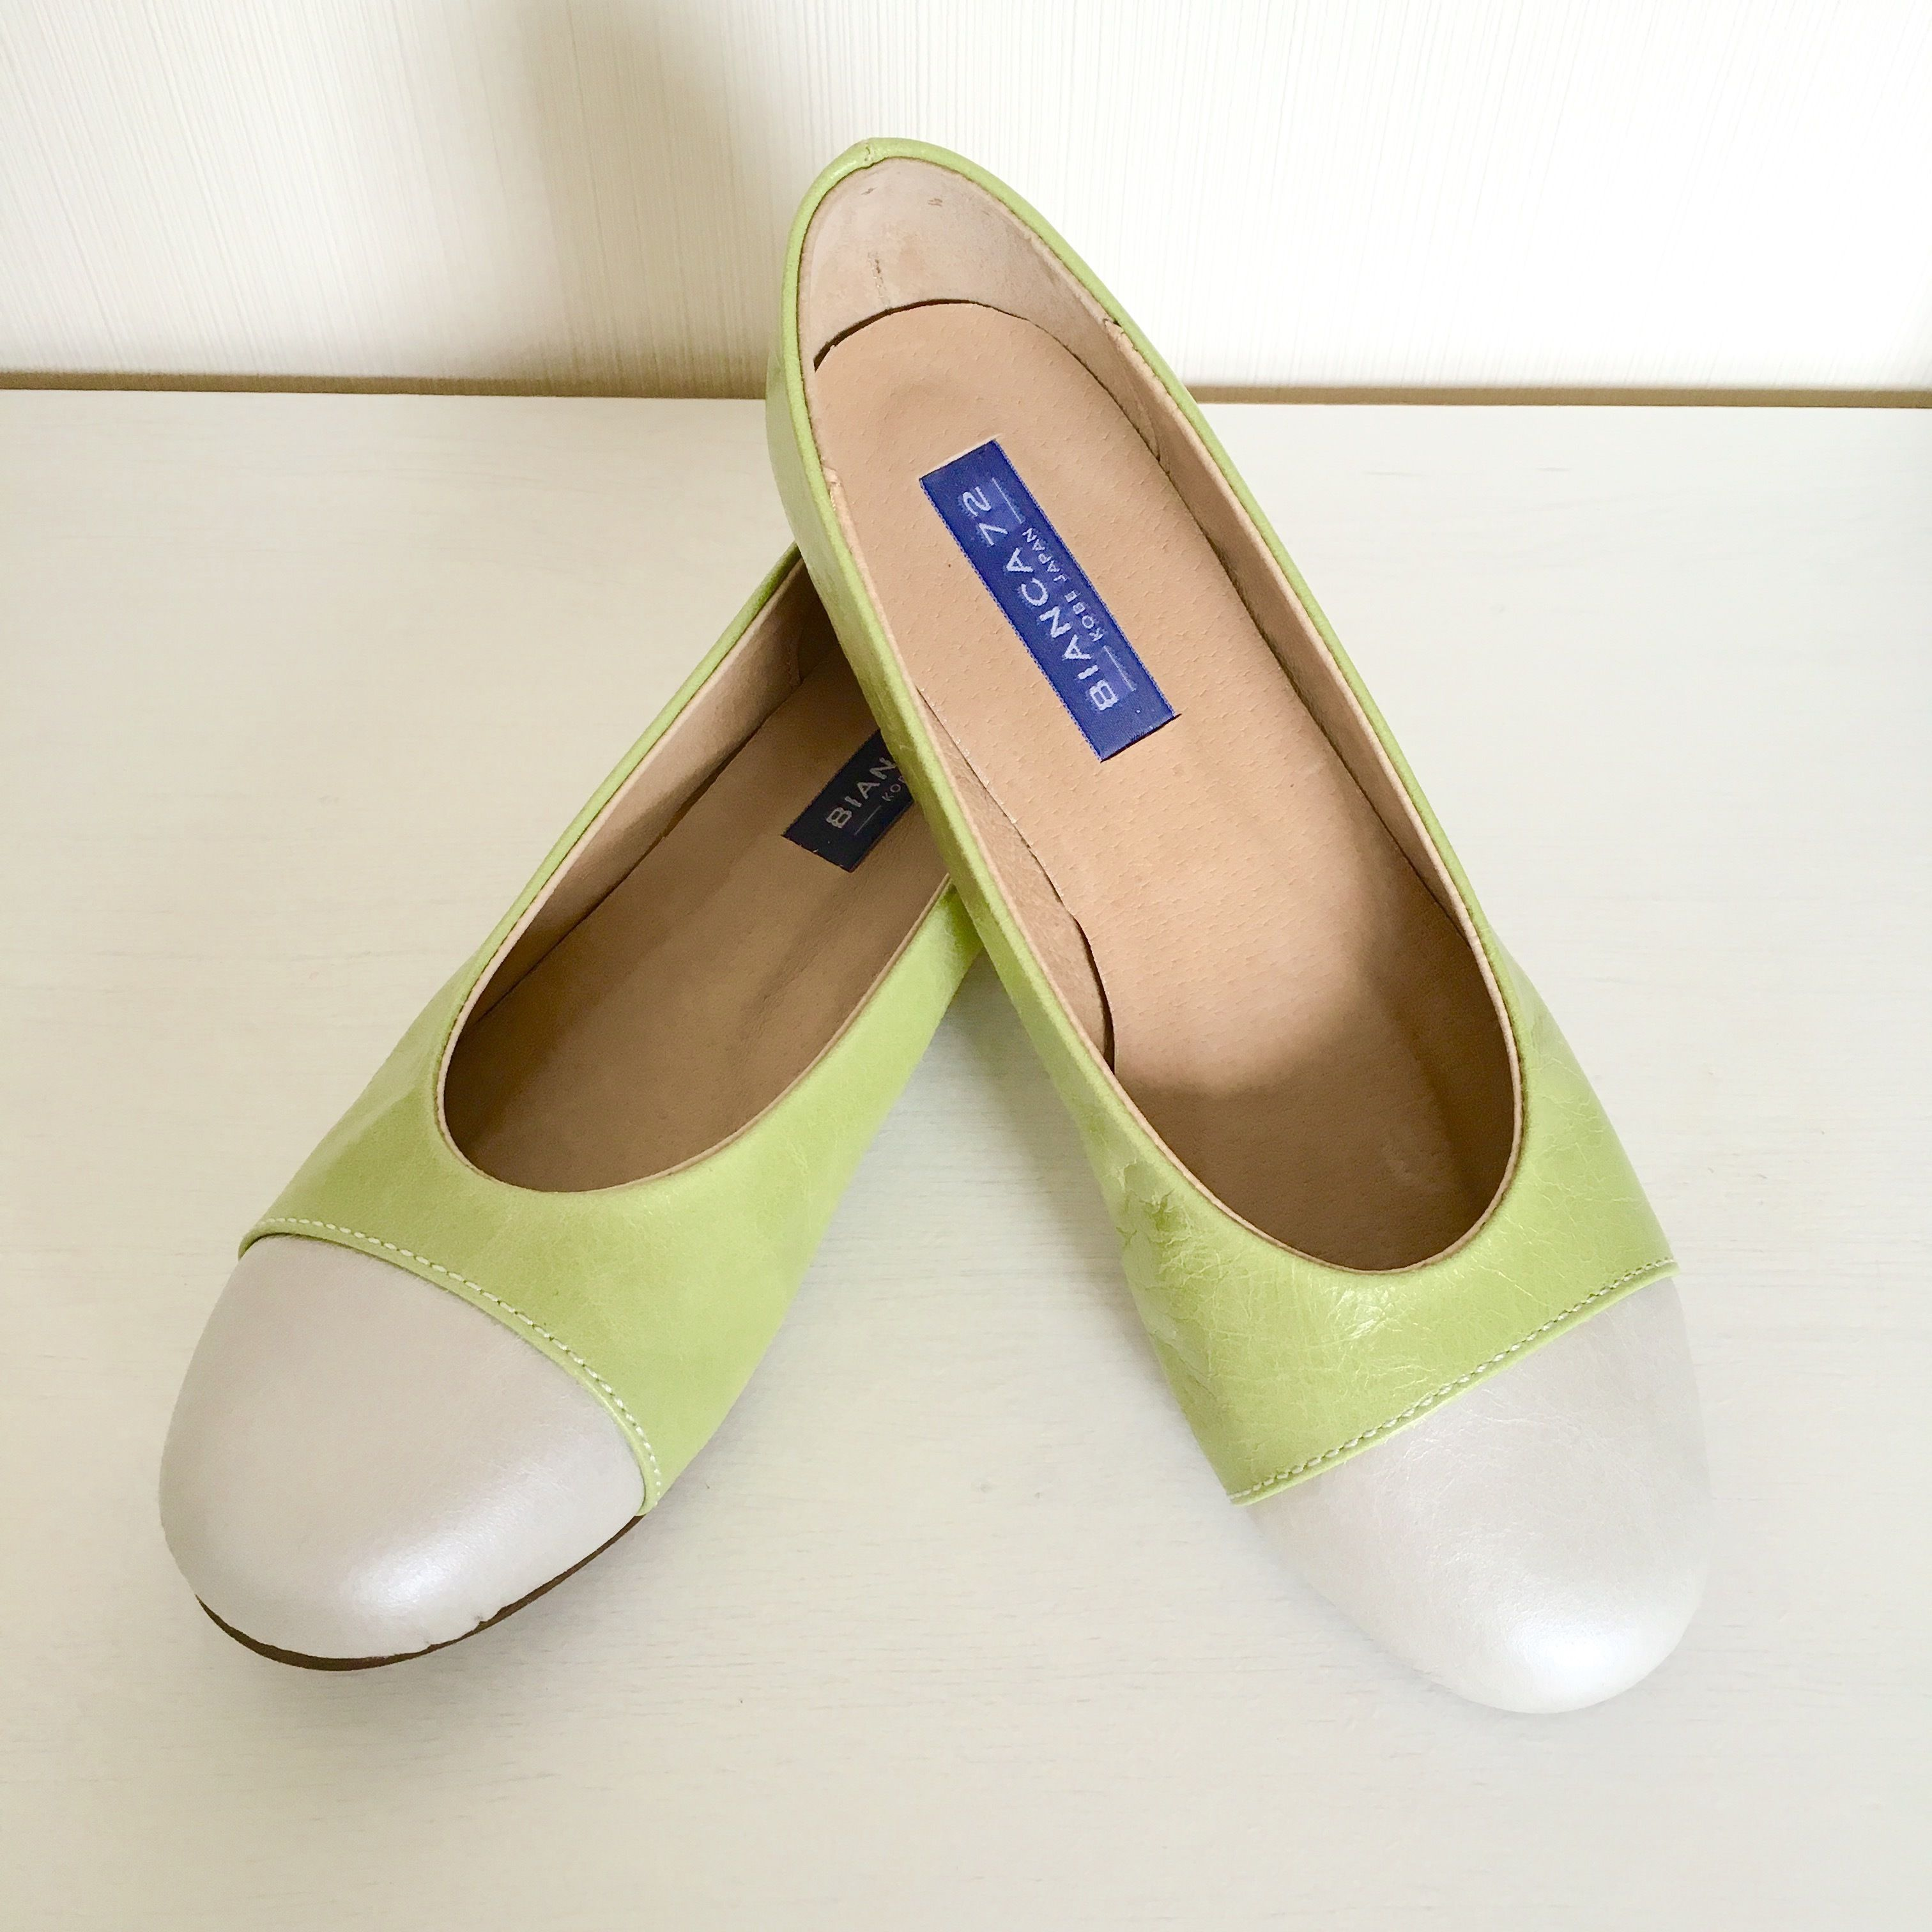 Original handmade leather ballet shoes[MACARON]オリジナルハンドメイドレザーバレエ「マカロン」シルバー×シャイニーグリーン